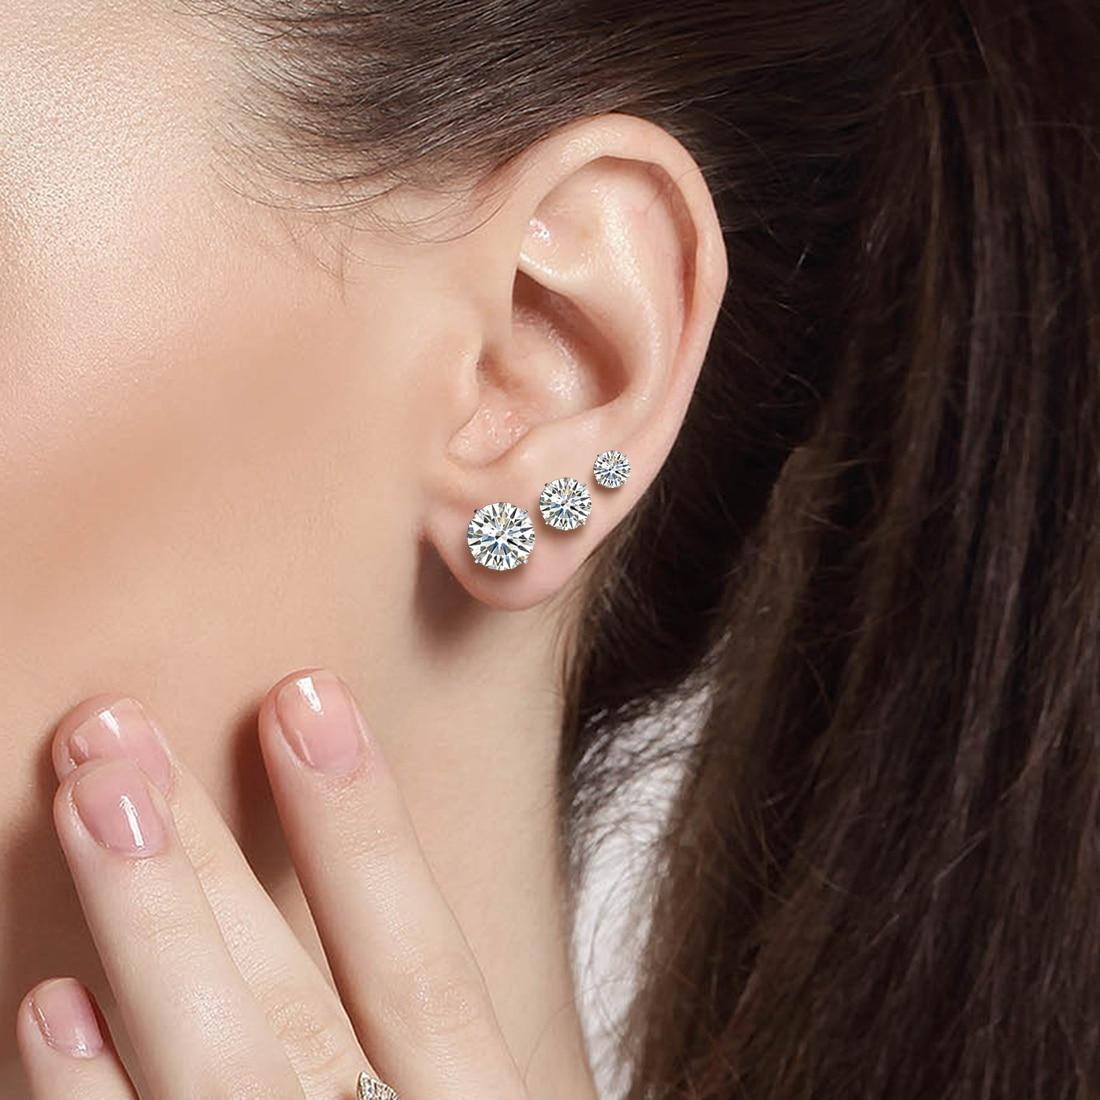 Jiayiqi Real 925 Sterling Silver Earrings 3-8mm Four Claws Crystal Zircon Silver Stud Earrings For Women Sterling Silver Jewelry 3